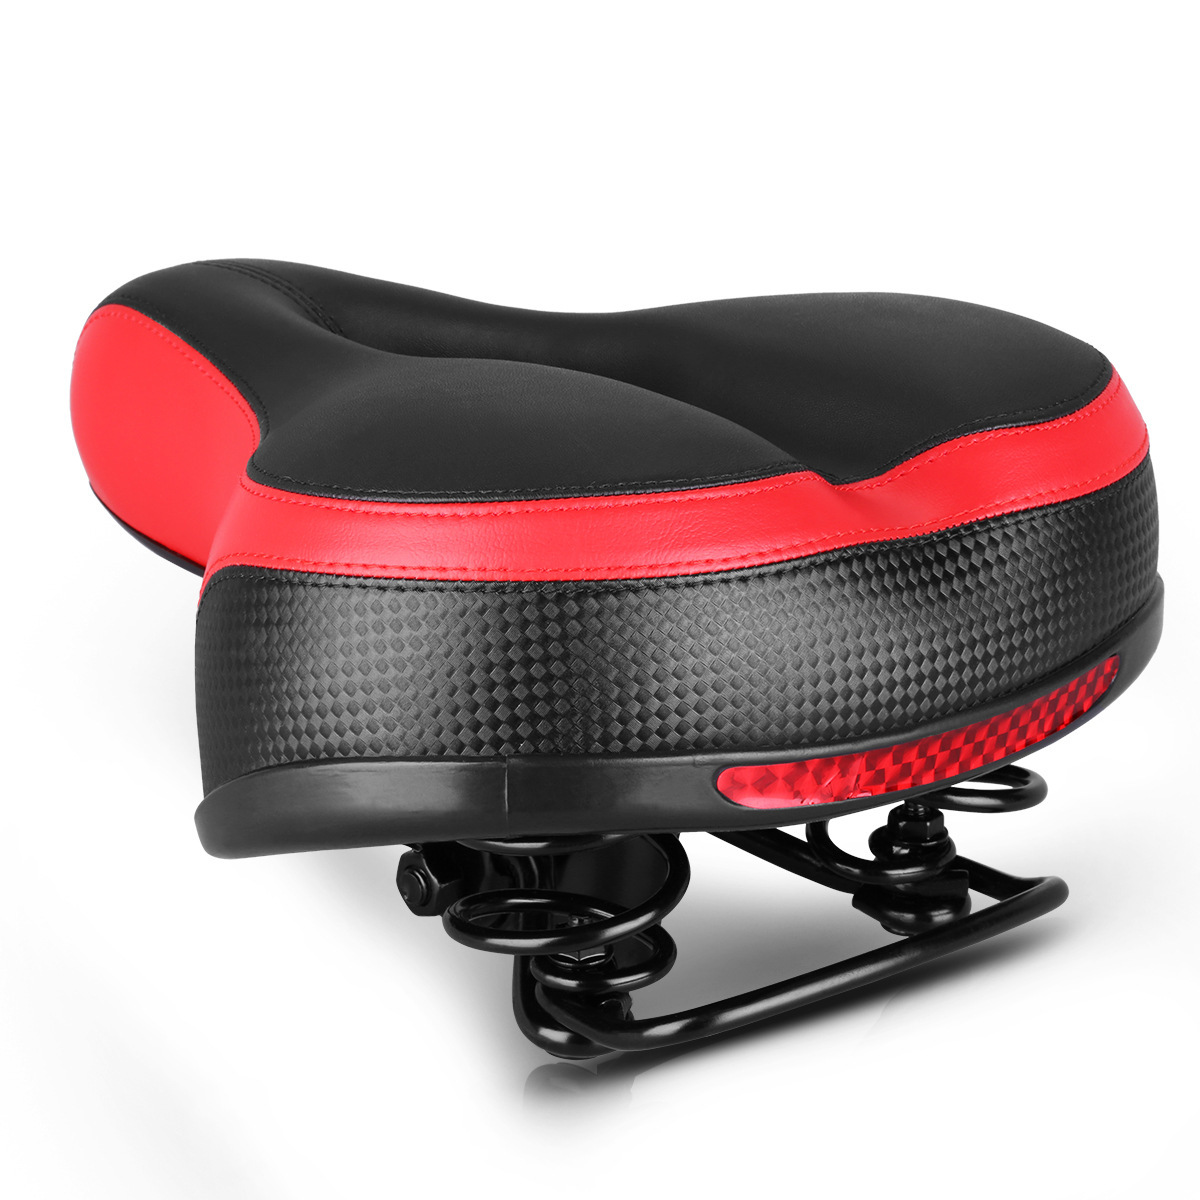 Large Butt Bicycle Seat Cushion Mountain Bike Seat Cushion Saddle Widened Plus Soft Thick Sponge Seat Pad Bicycle Equipment